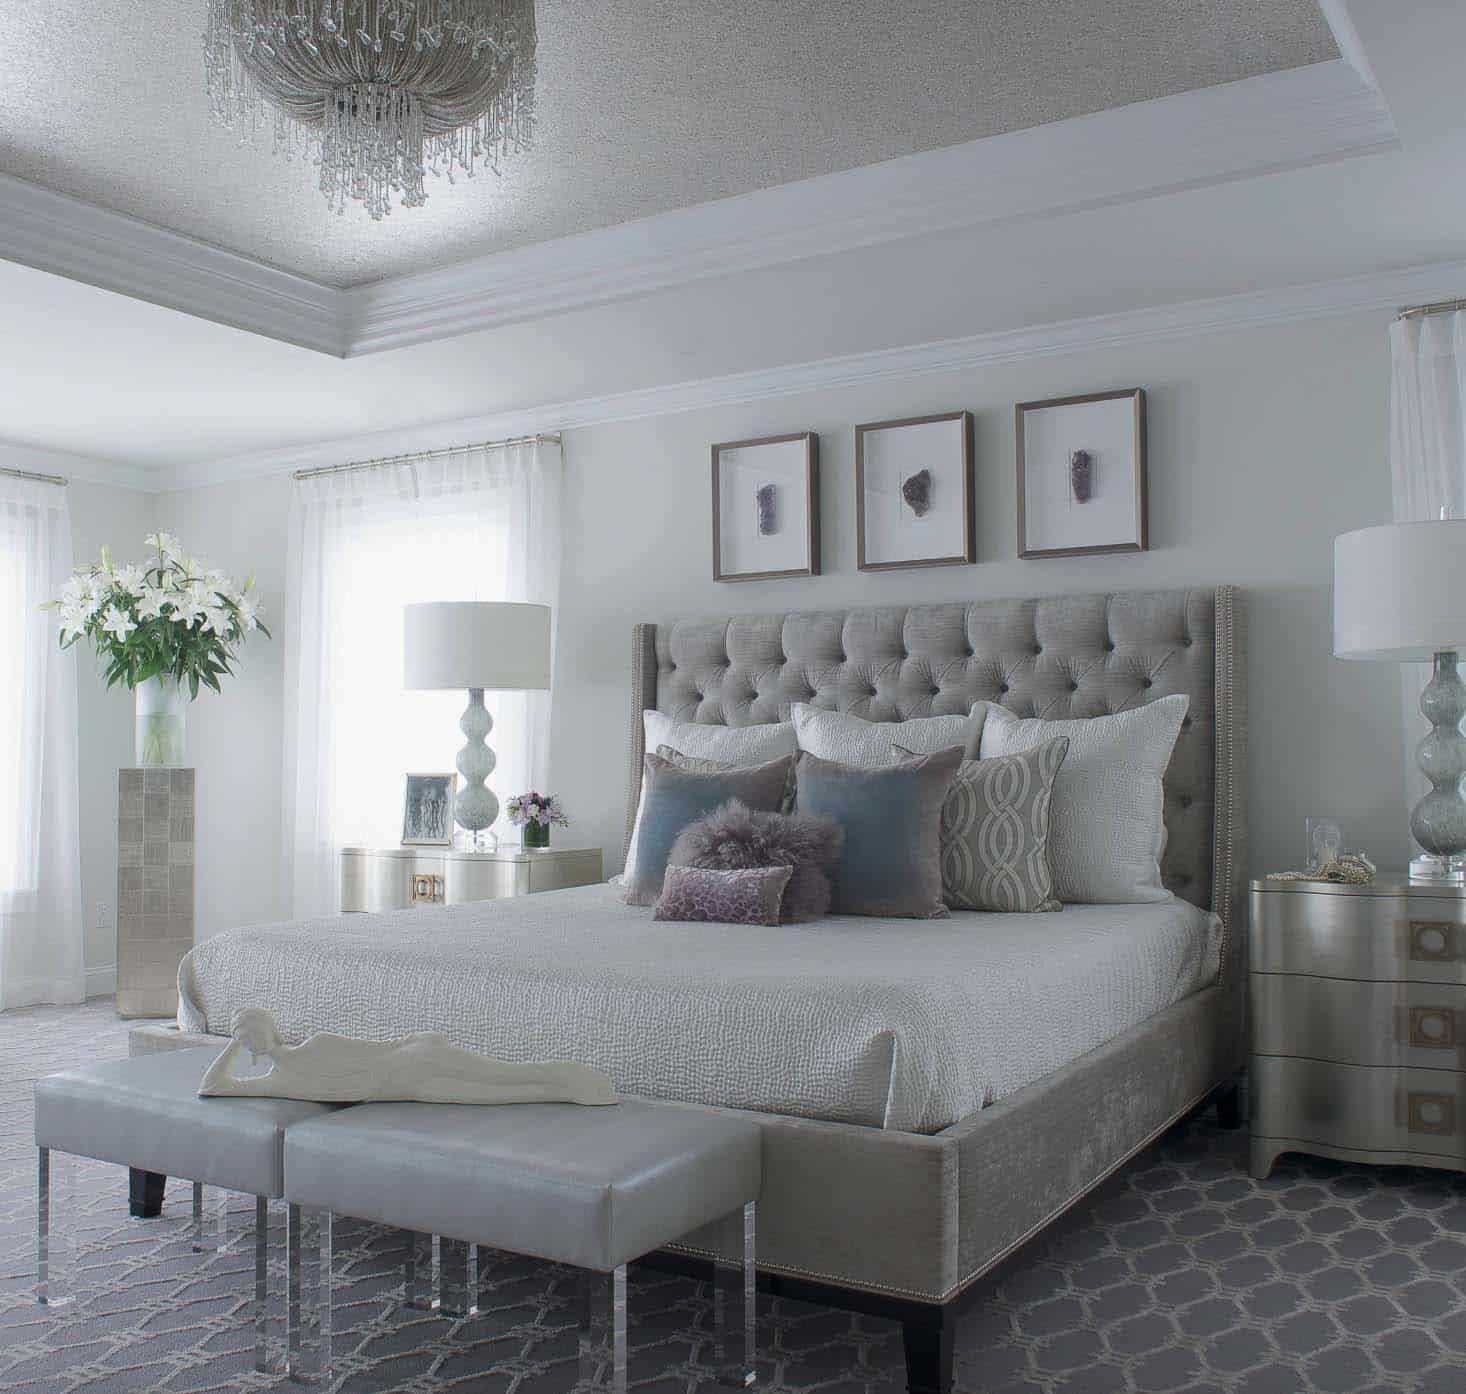 20 Serene And Elegant Master Bedroom Decorating Ideas Master